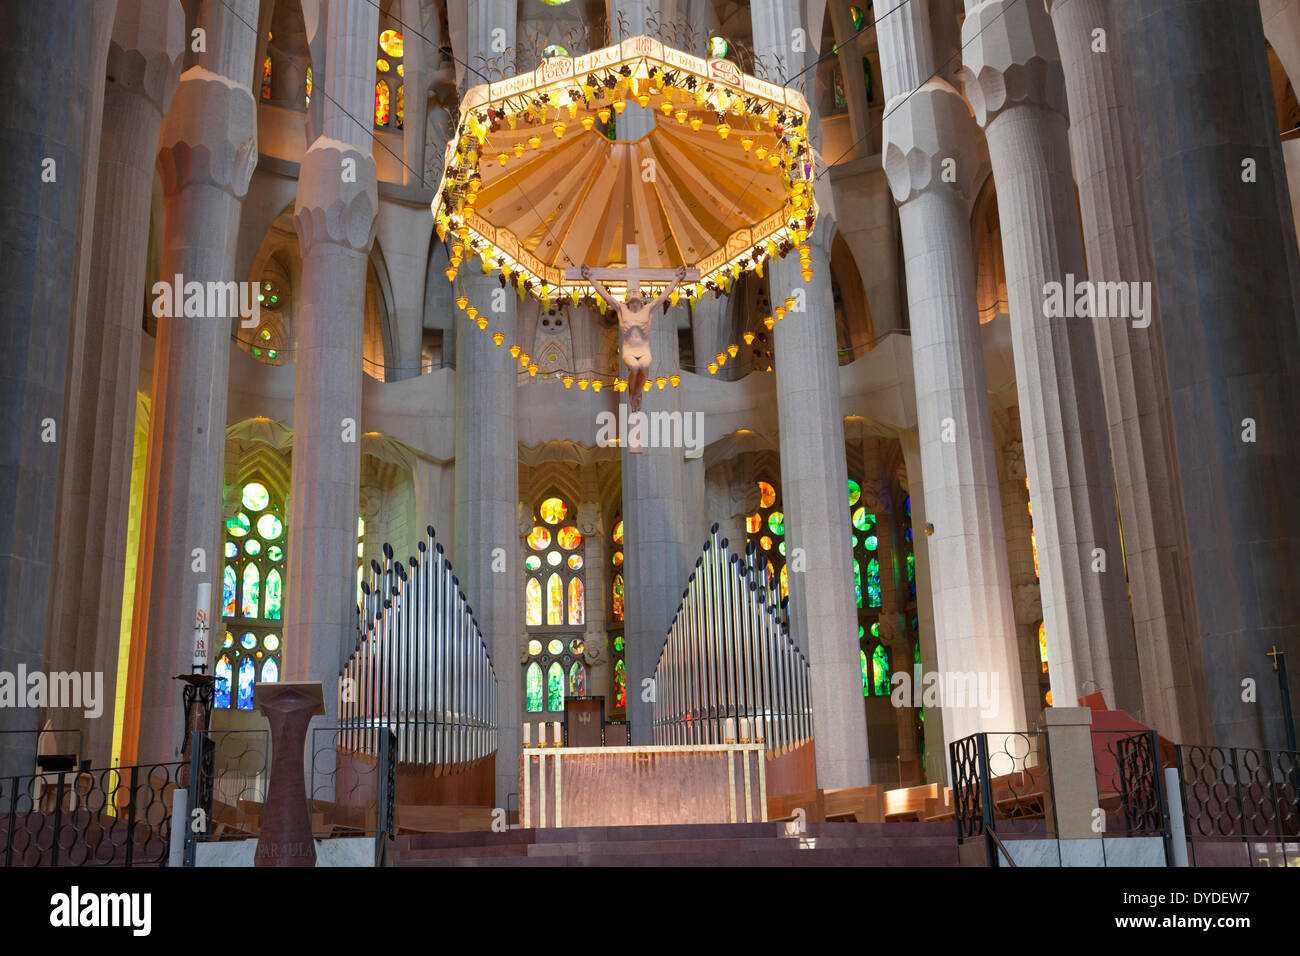 Altar and pillars inside la sagrada familia cathedral in for La sagrada familia inside